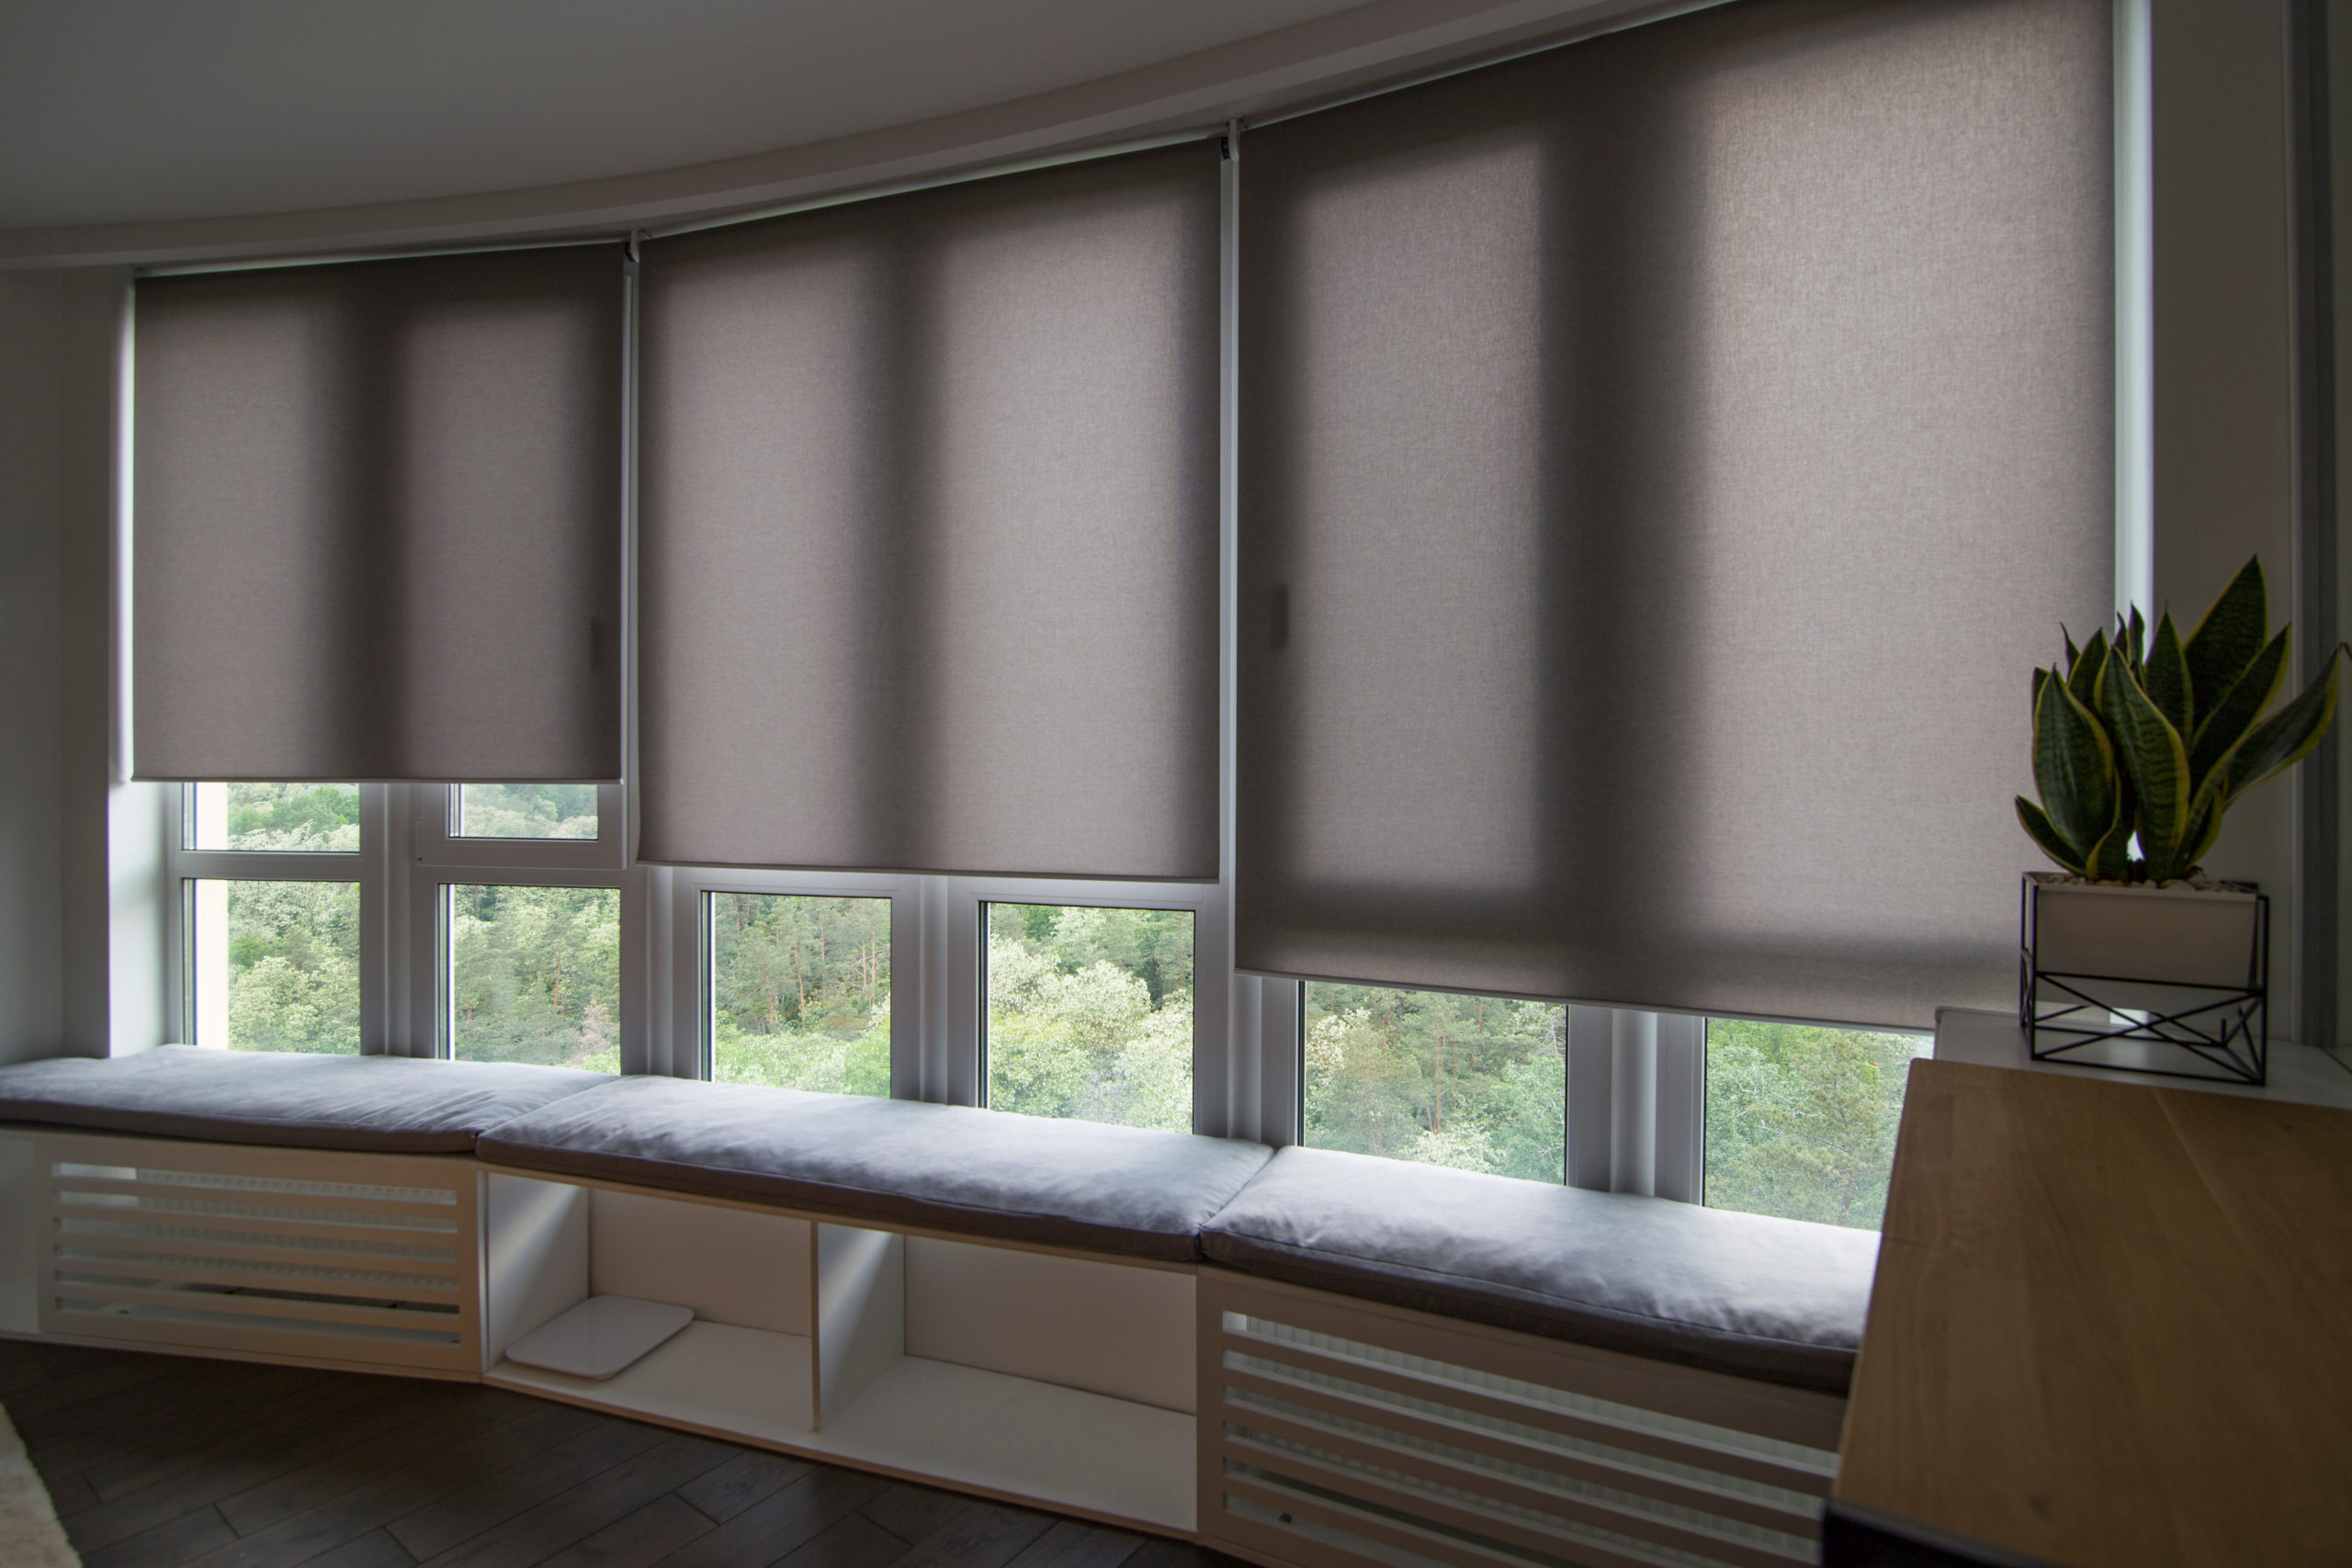 senfa-blinds-fire-retardant properties textile fiberglass